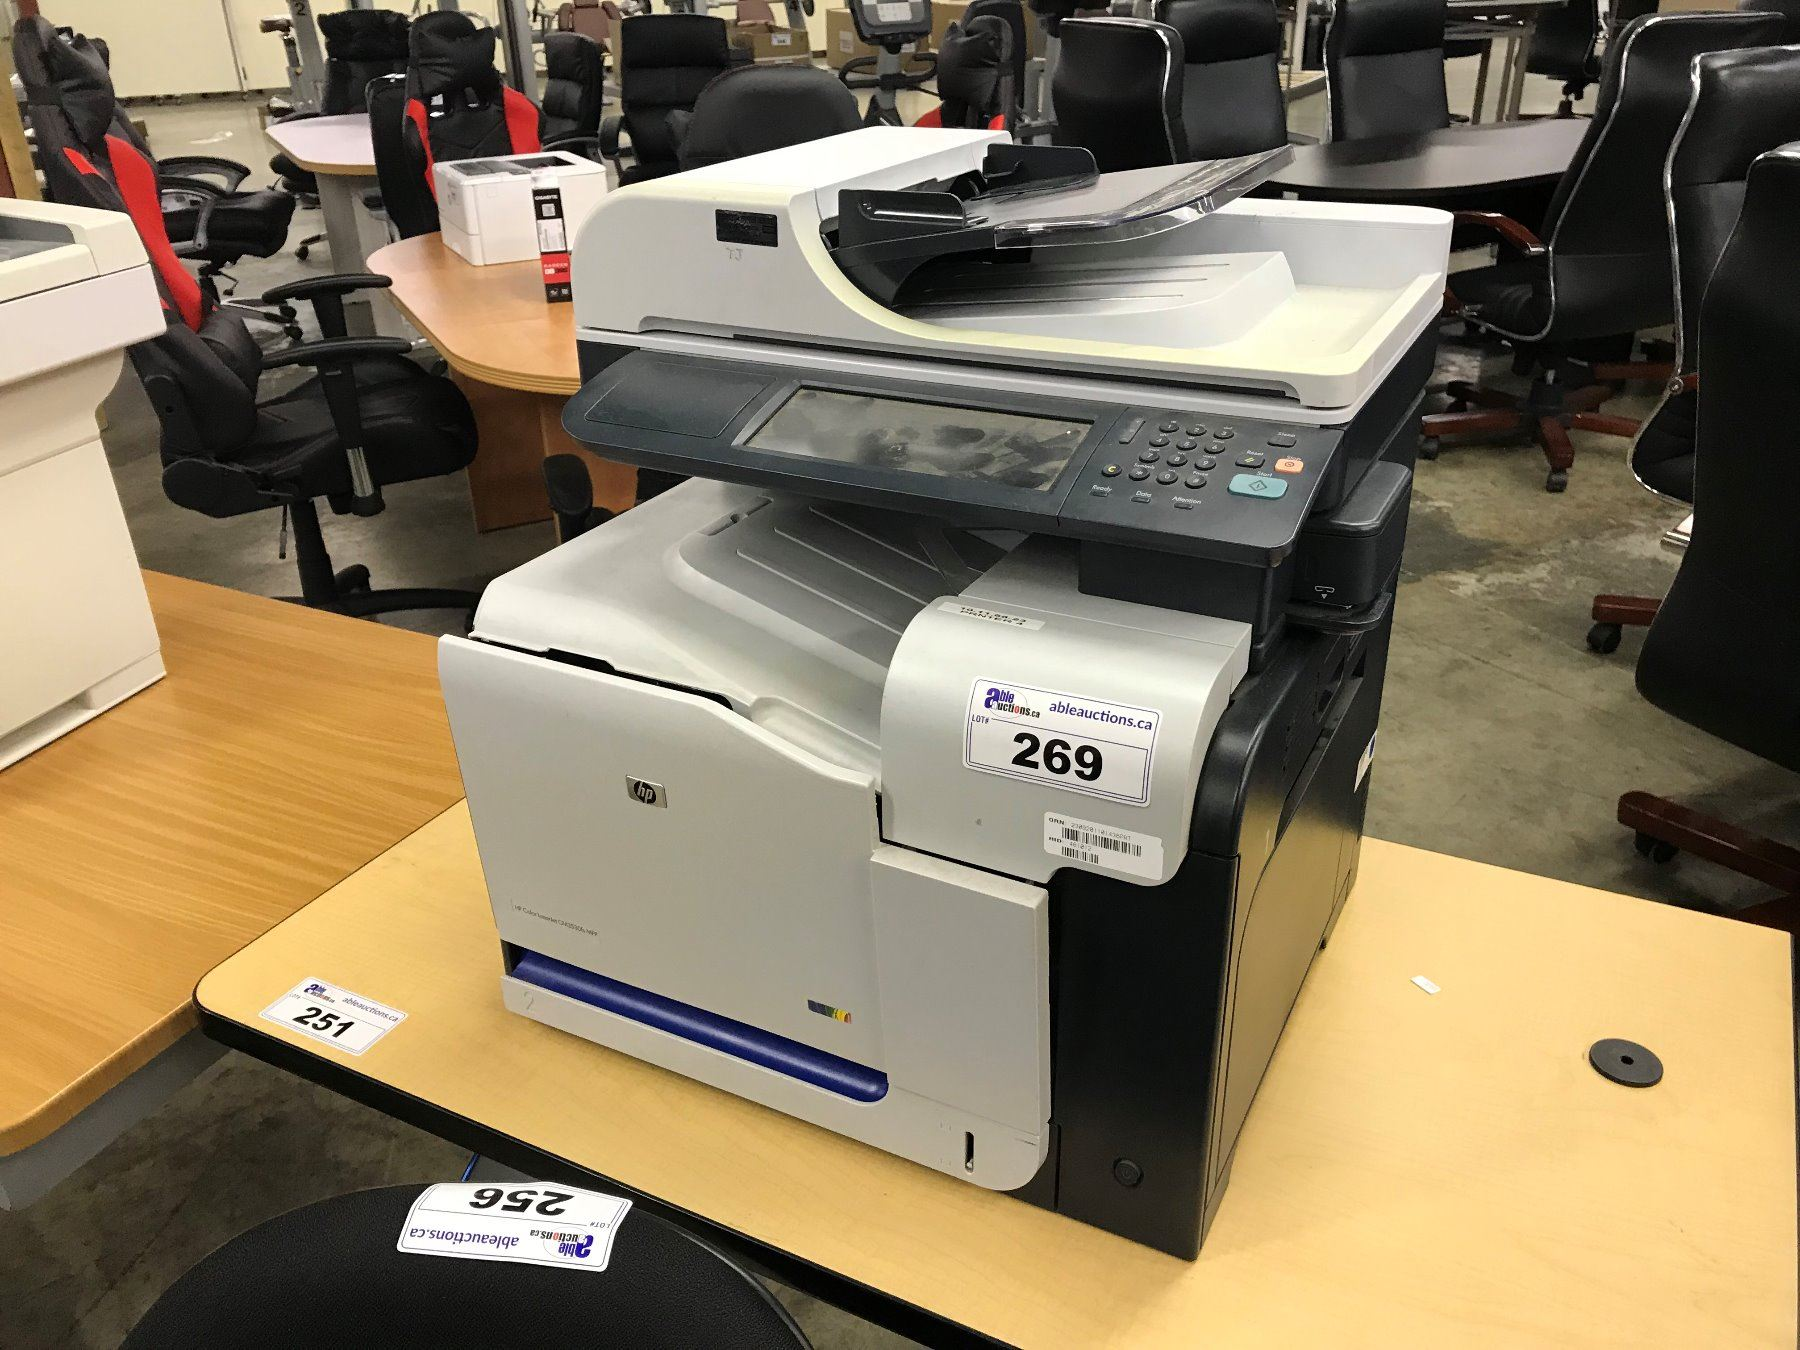 hp colour laserjet m3035fs multifunction printer (no toner)